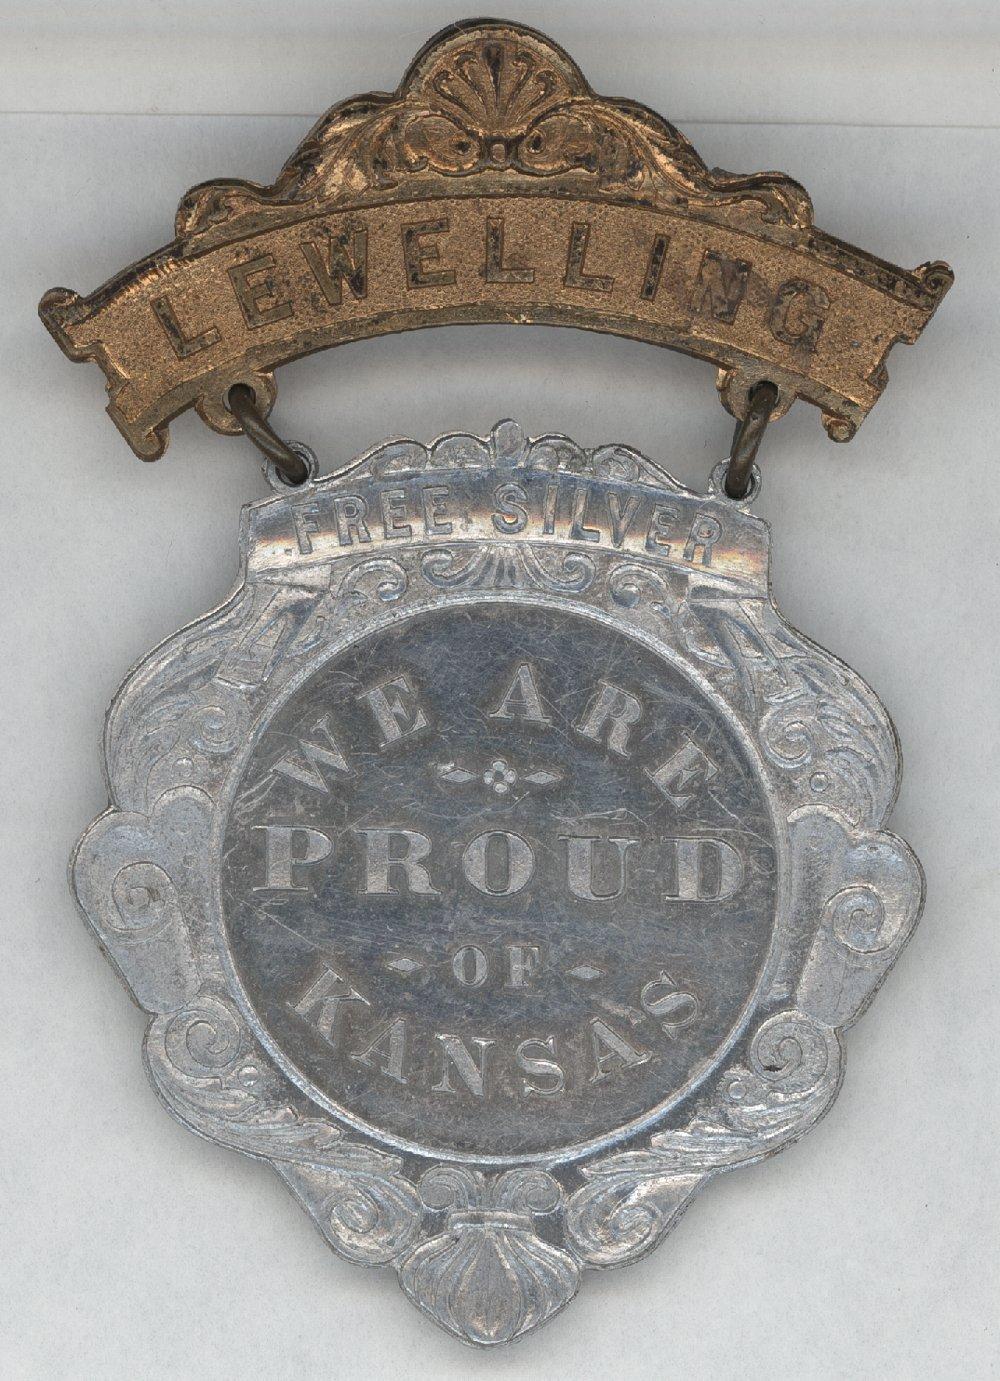 Lewelling political medal